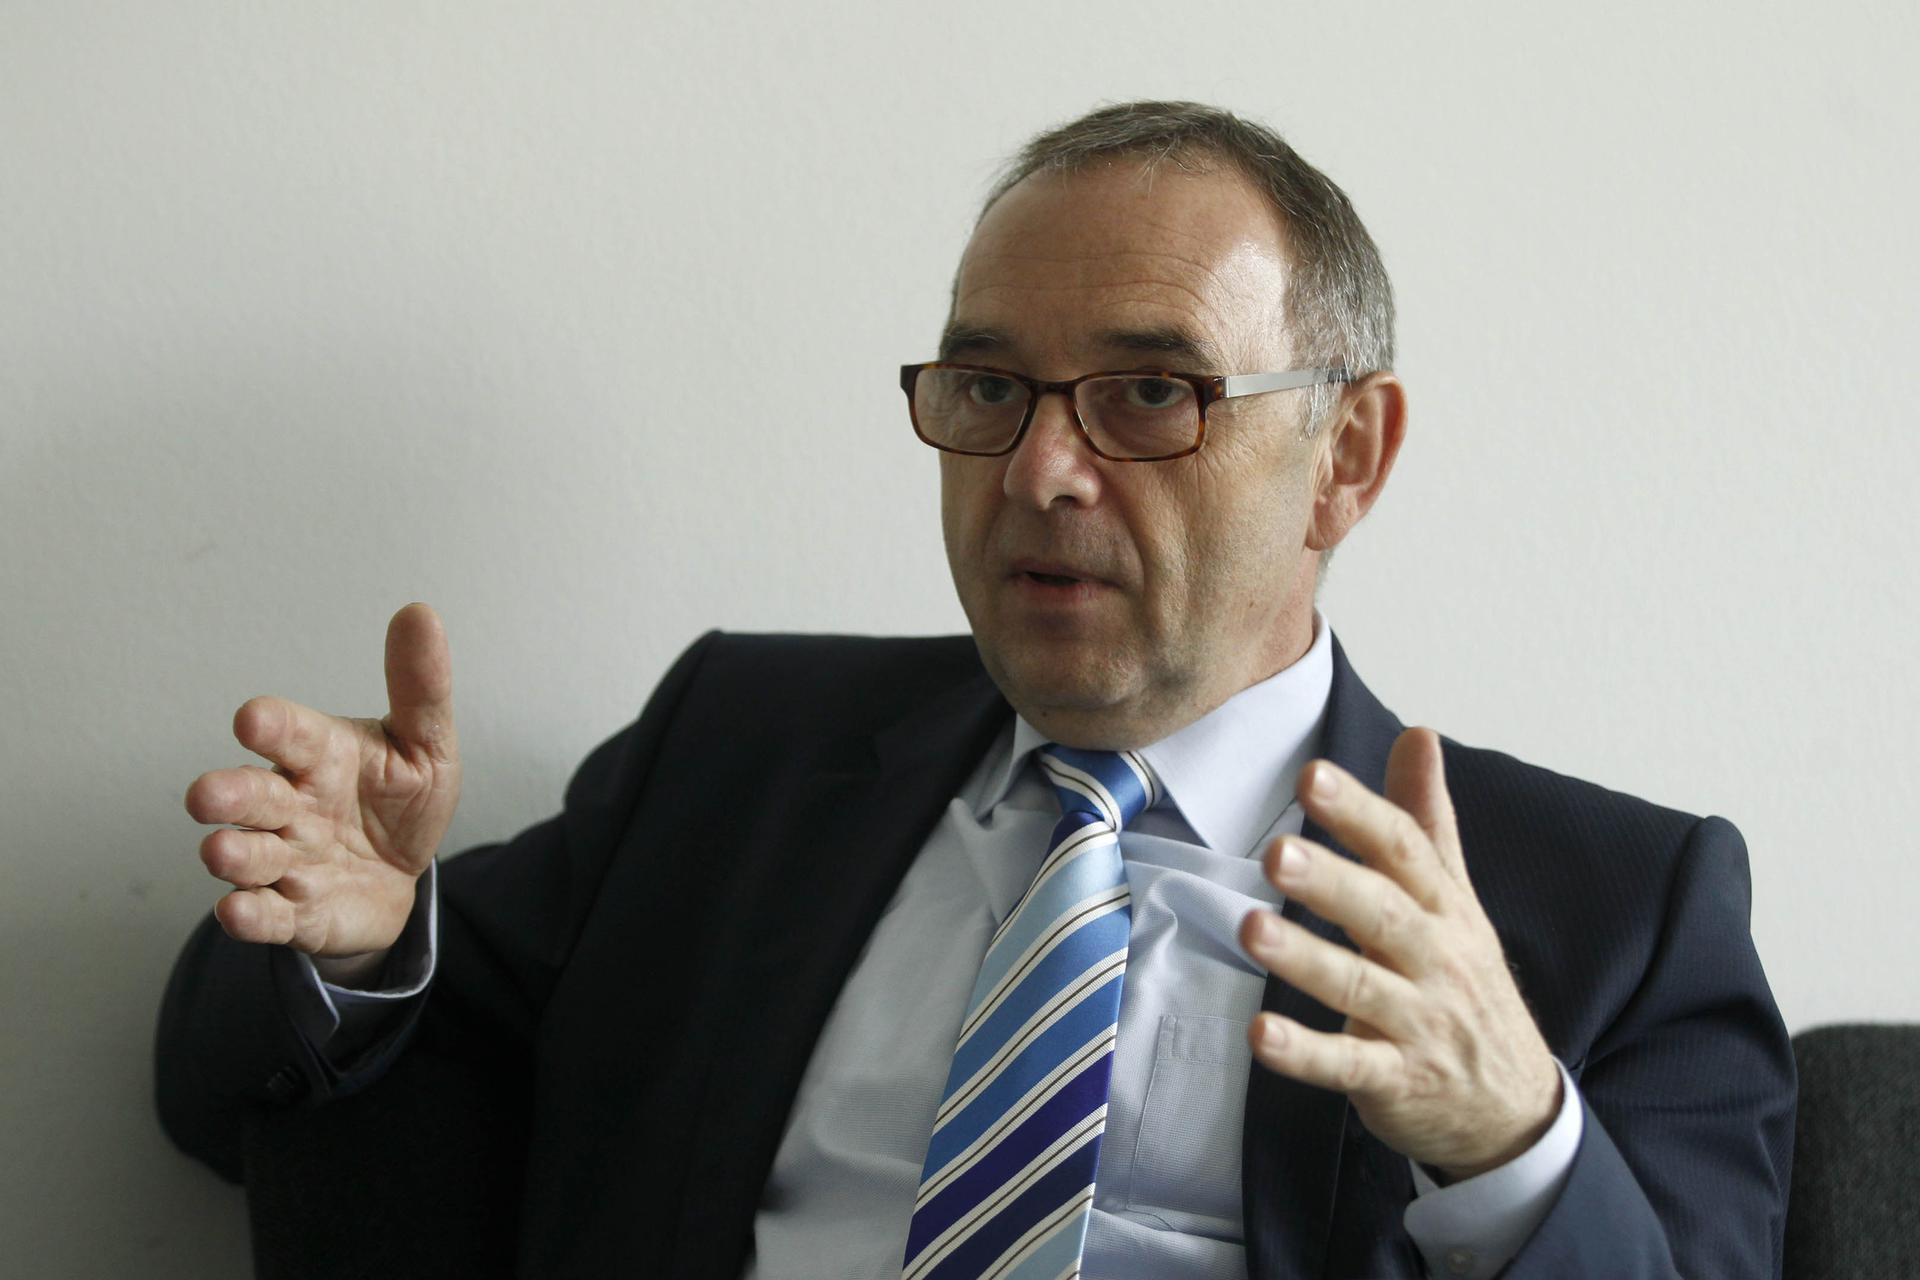 Norbert-Walter Borjans, Υπουργος Οικονομικών, North Rhine-Westphalia